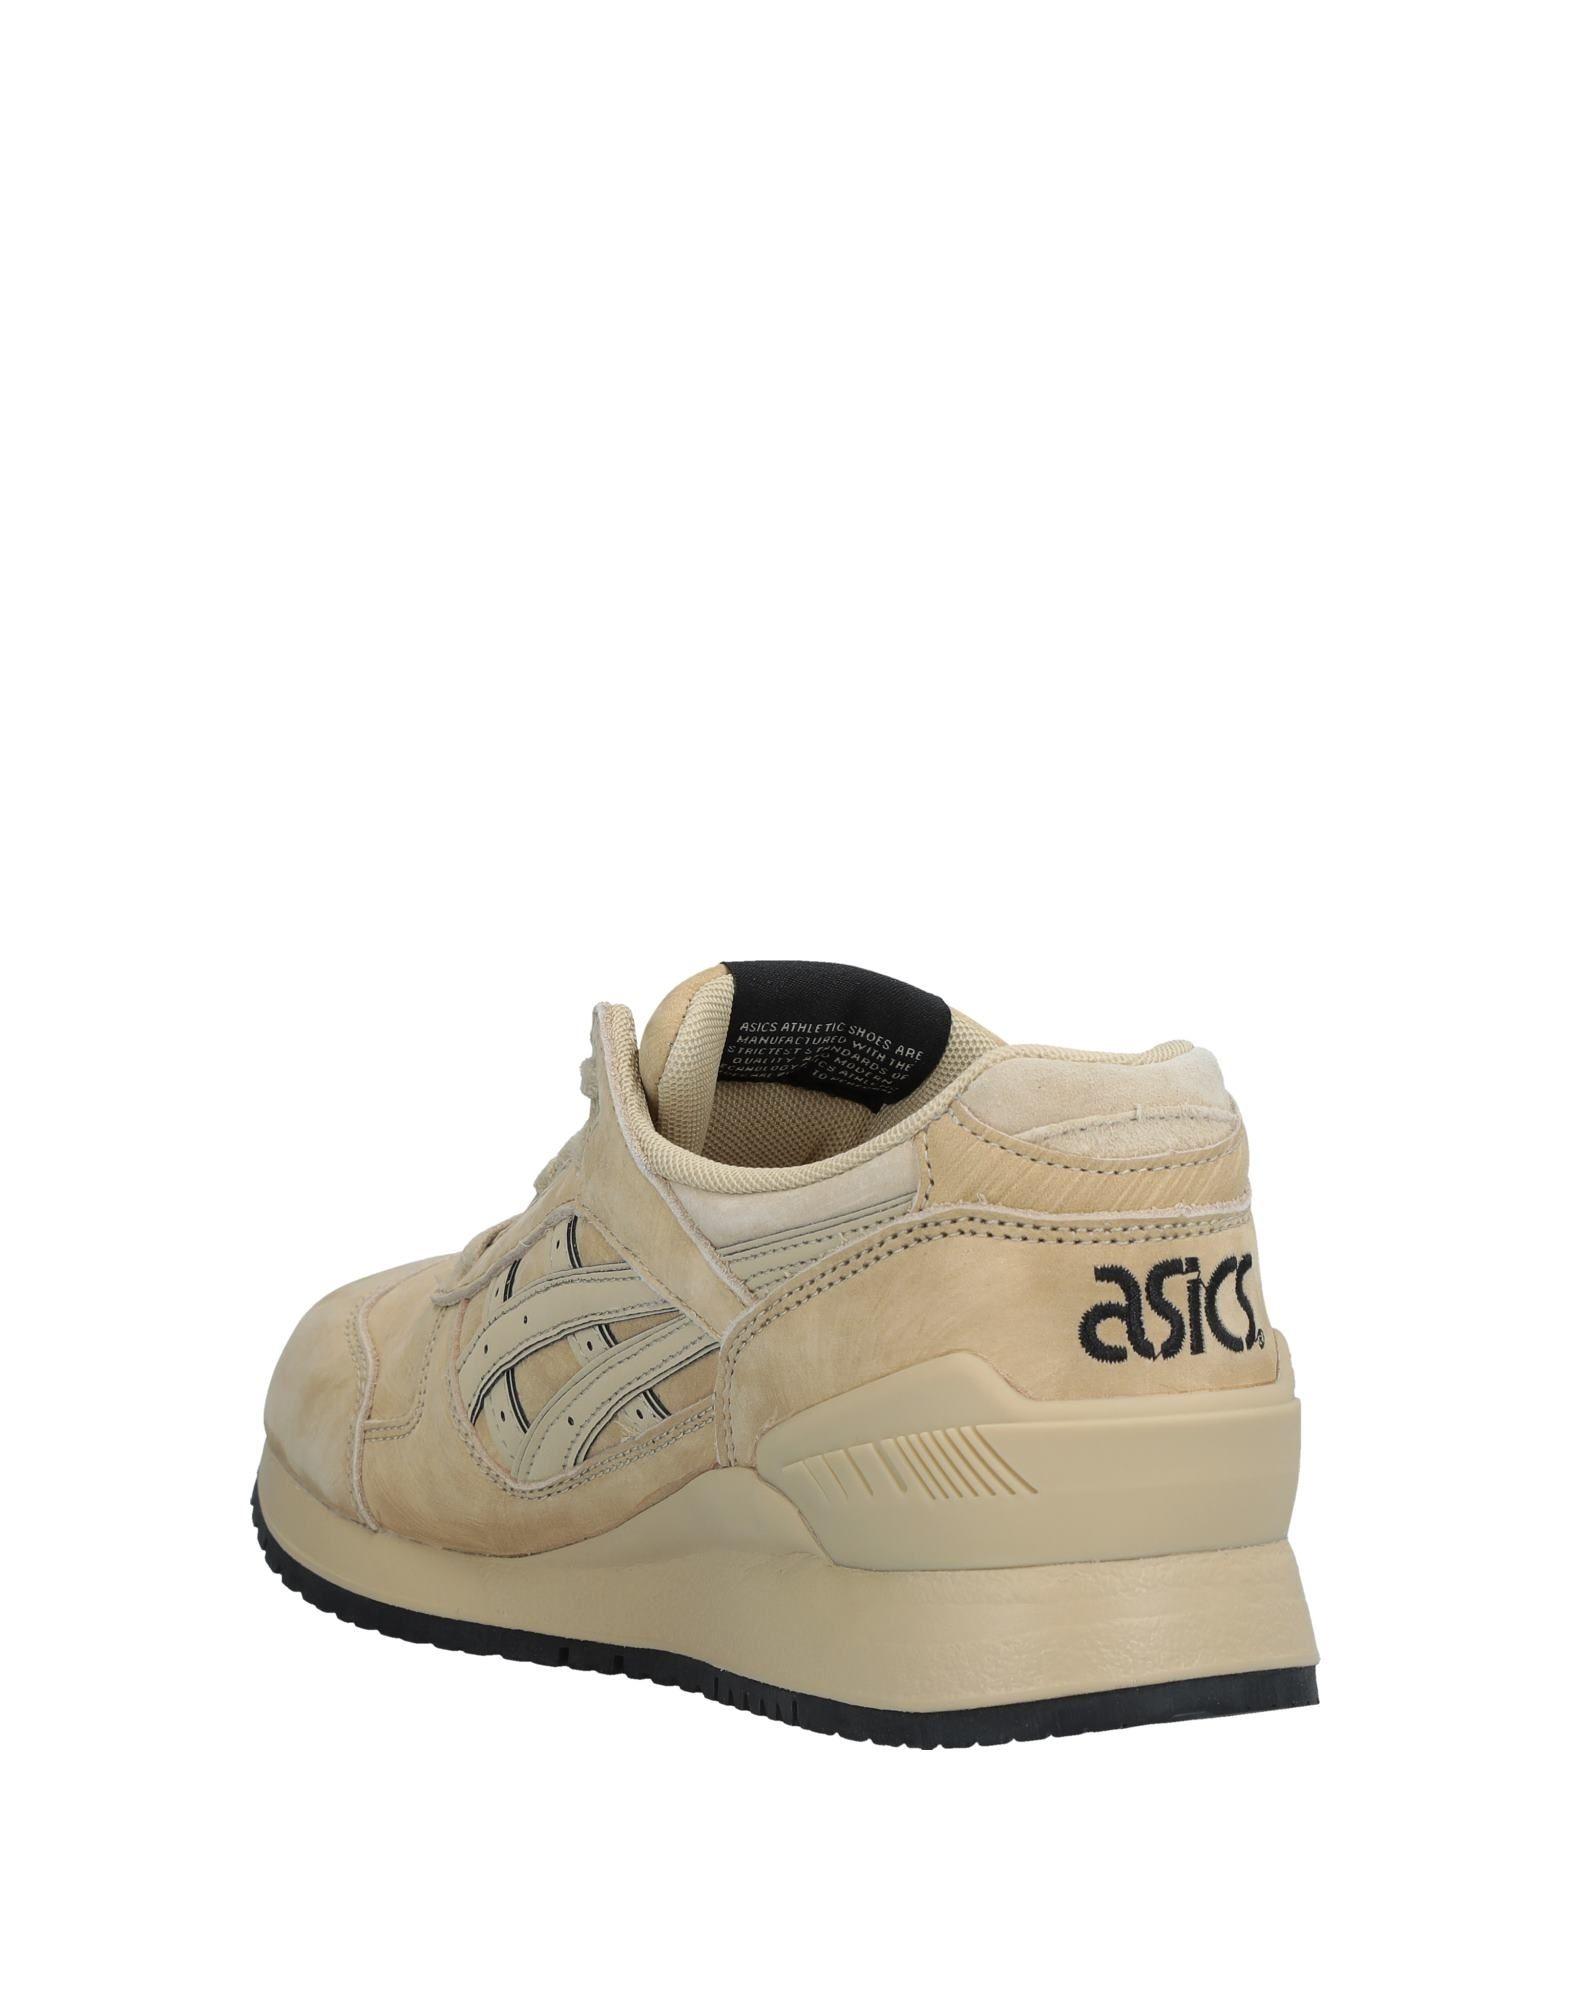 Asics Tiger Neue Sneakers Herren  11535871KQ Neue Tiger Schuhe d9b69c